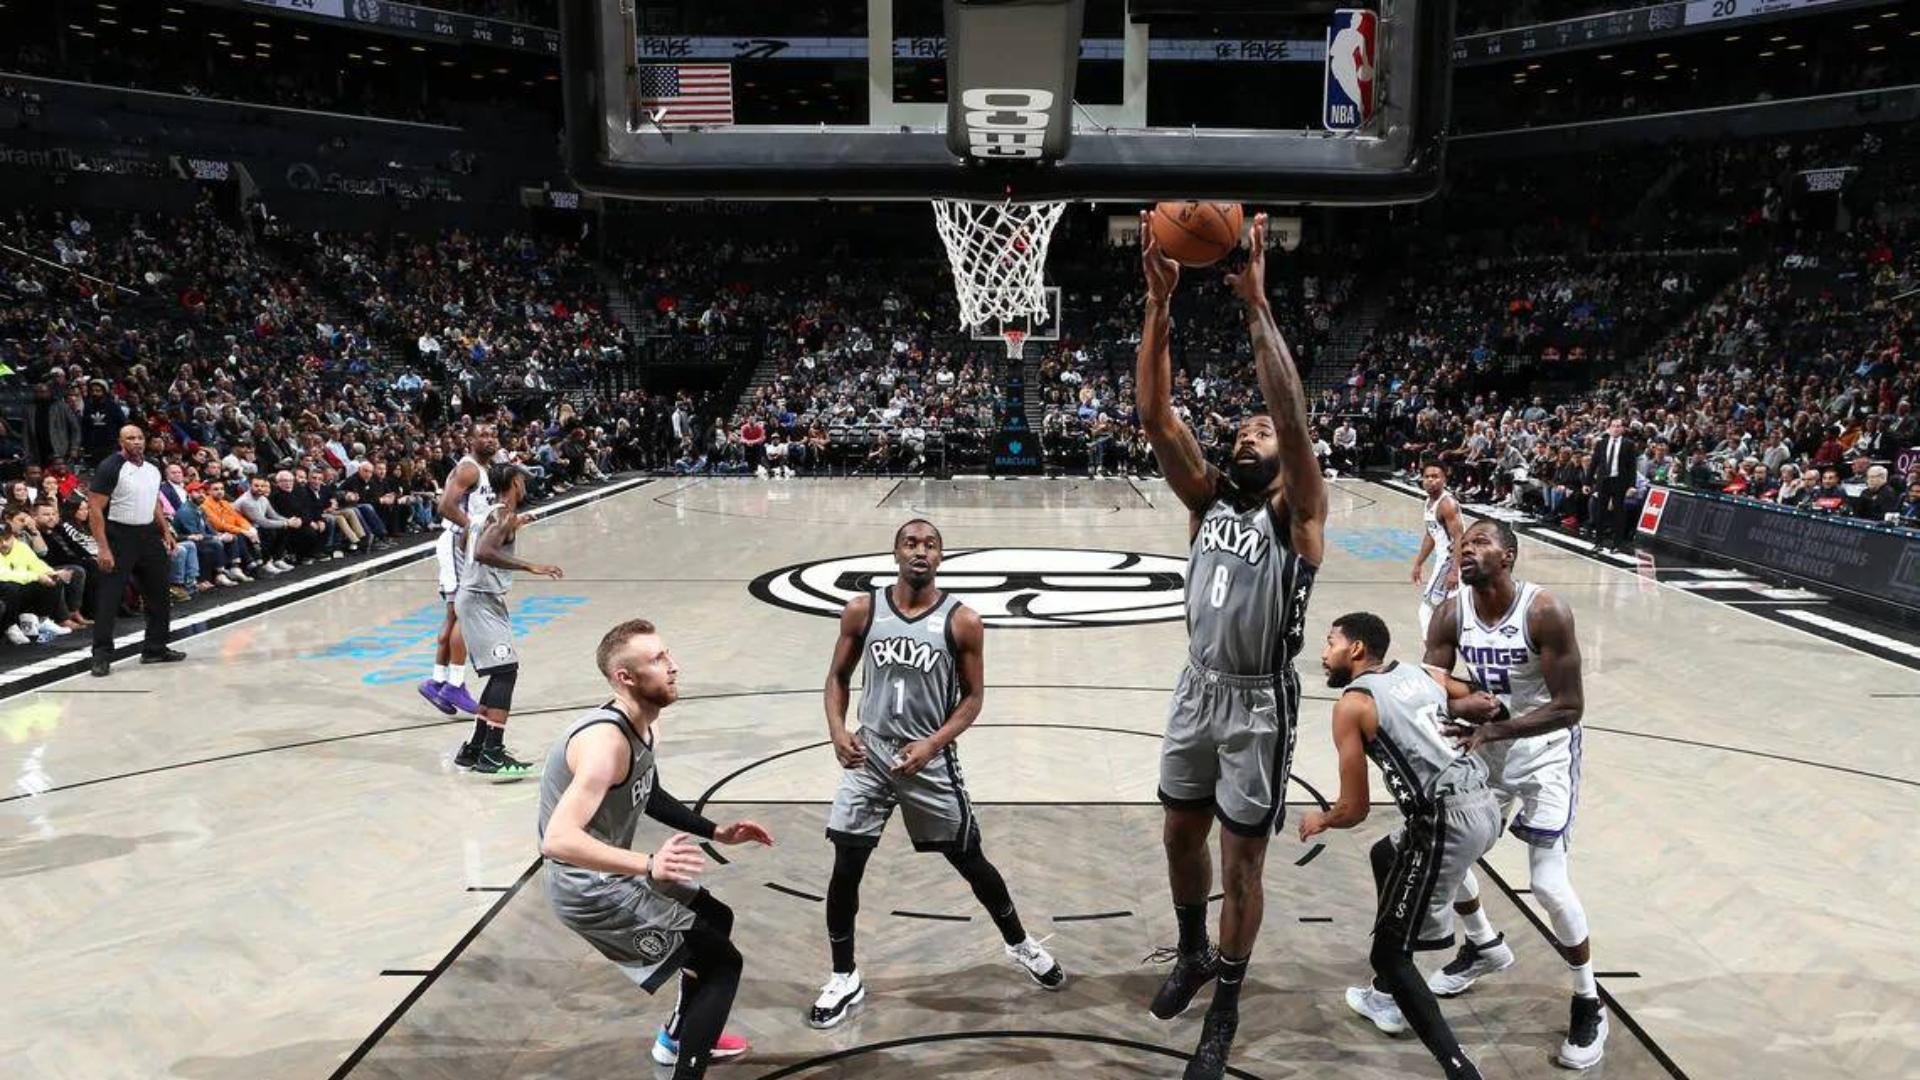 2019-2020 NBA常规赛 布鲁克林篮网 VS 萨克拉门托国王 集锦Part1